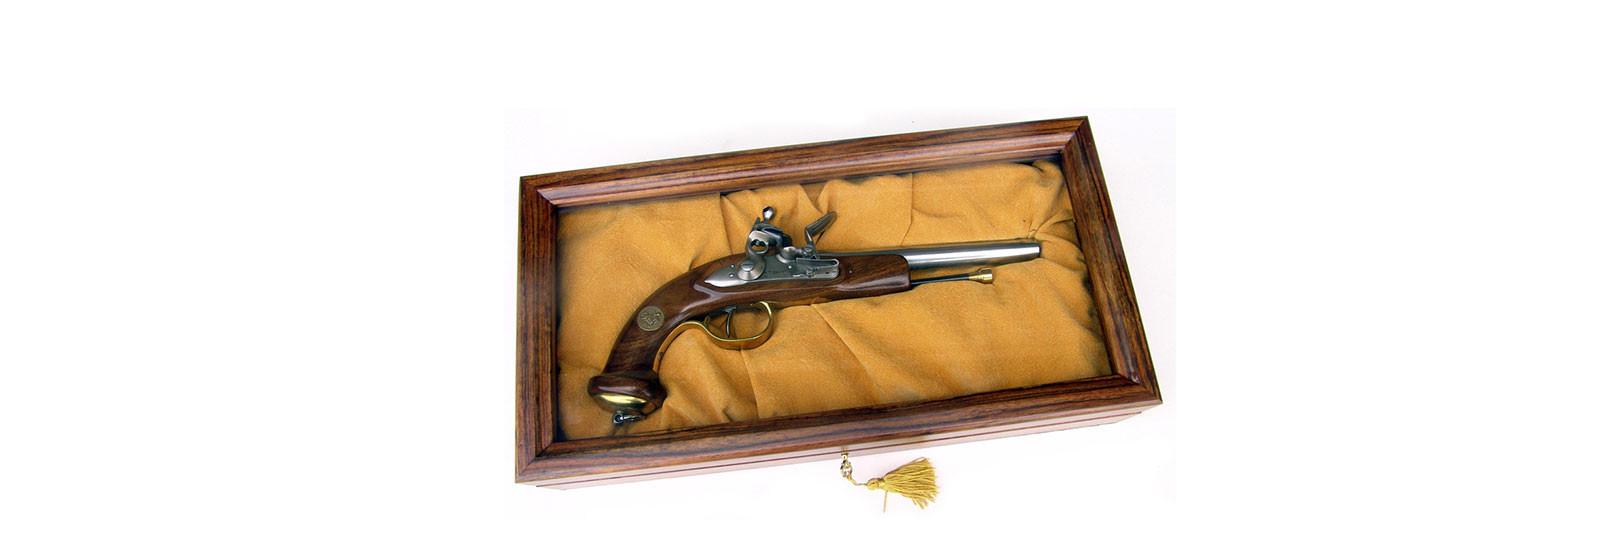 Mamelouk pistol comm. 14,5mm w/case